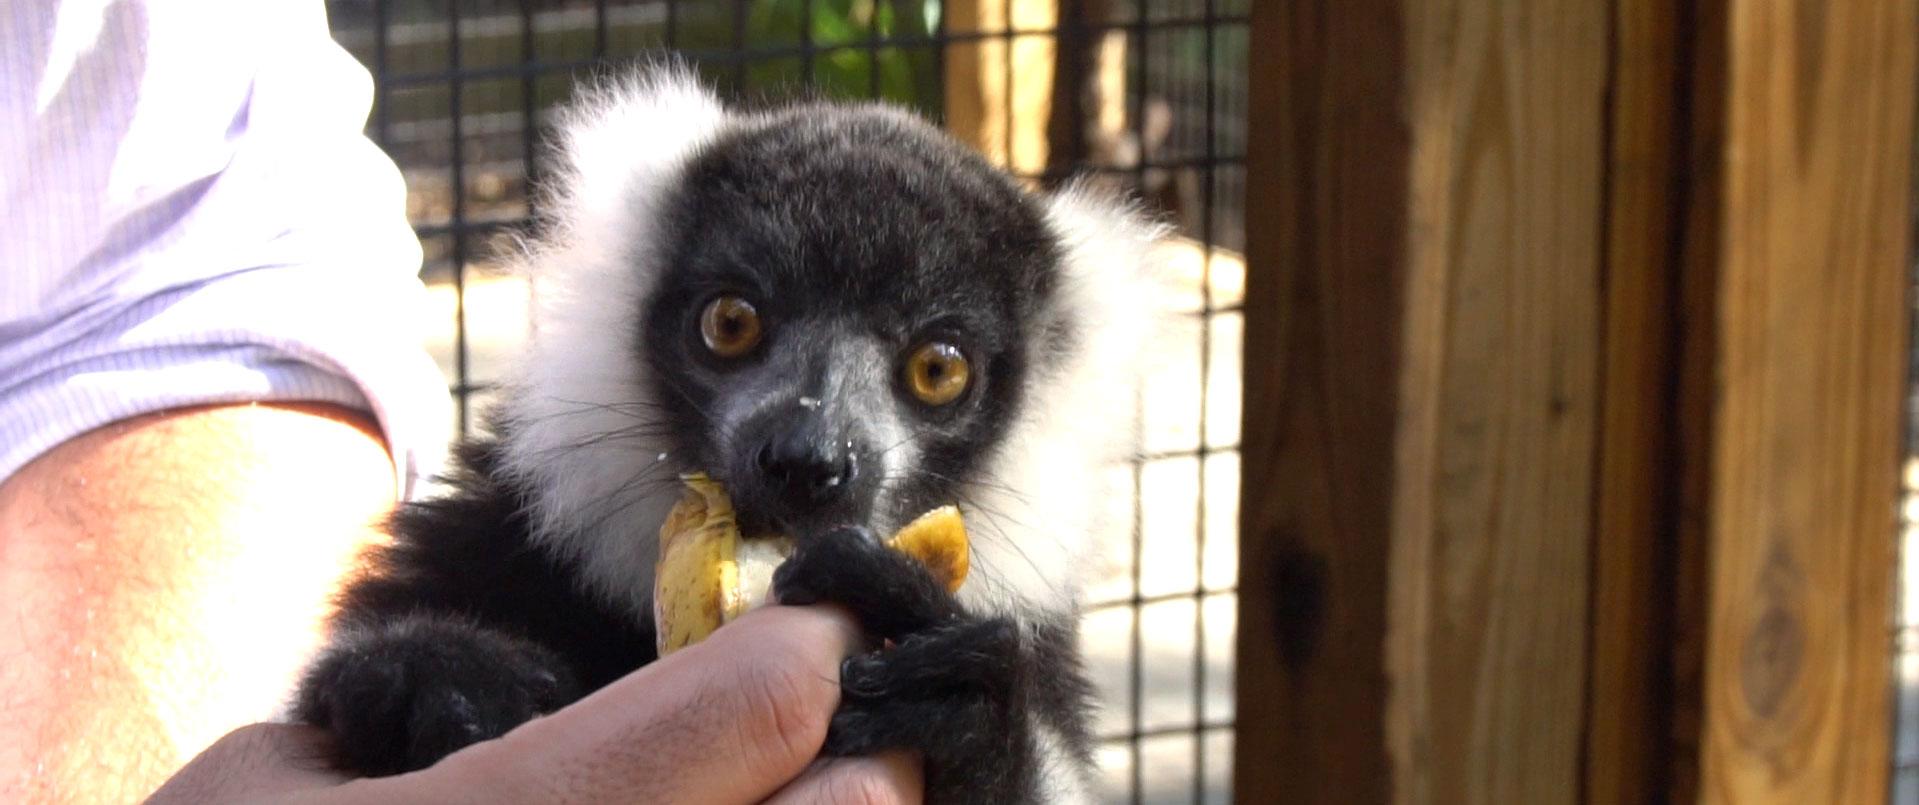 Volunteer at ZooWorld